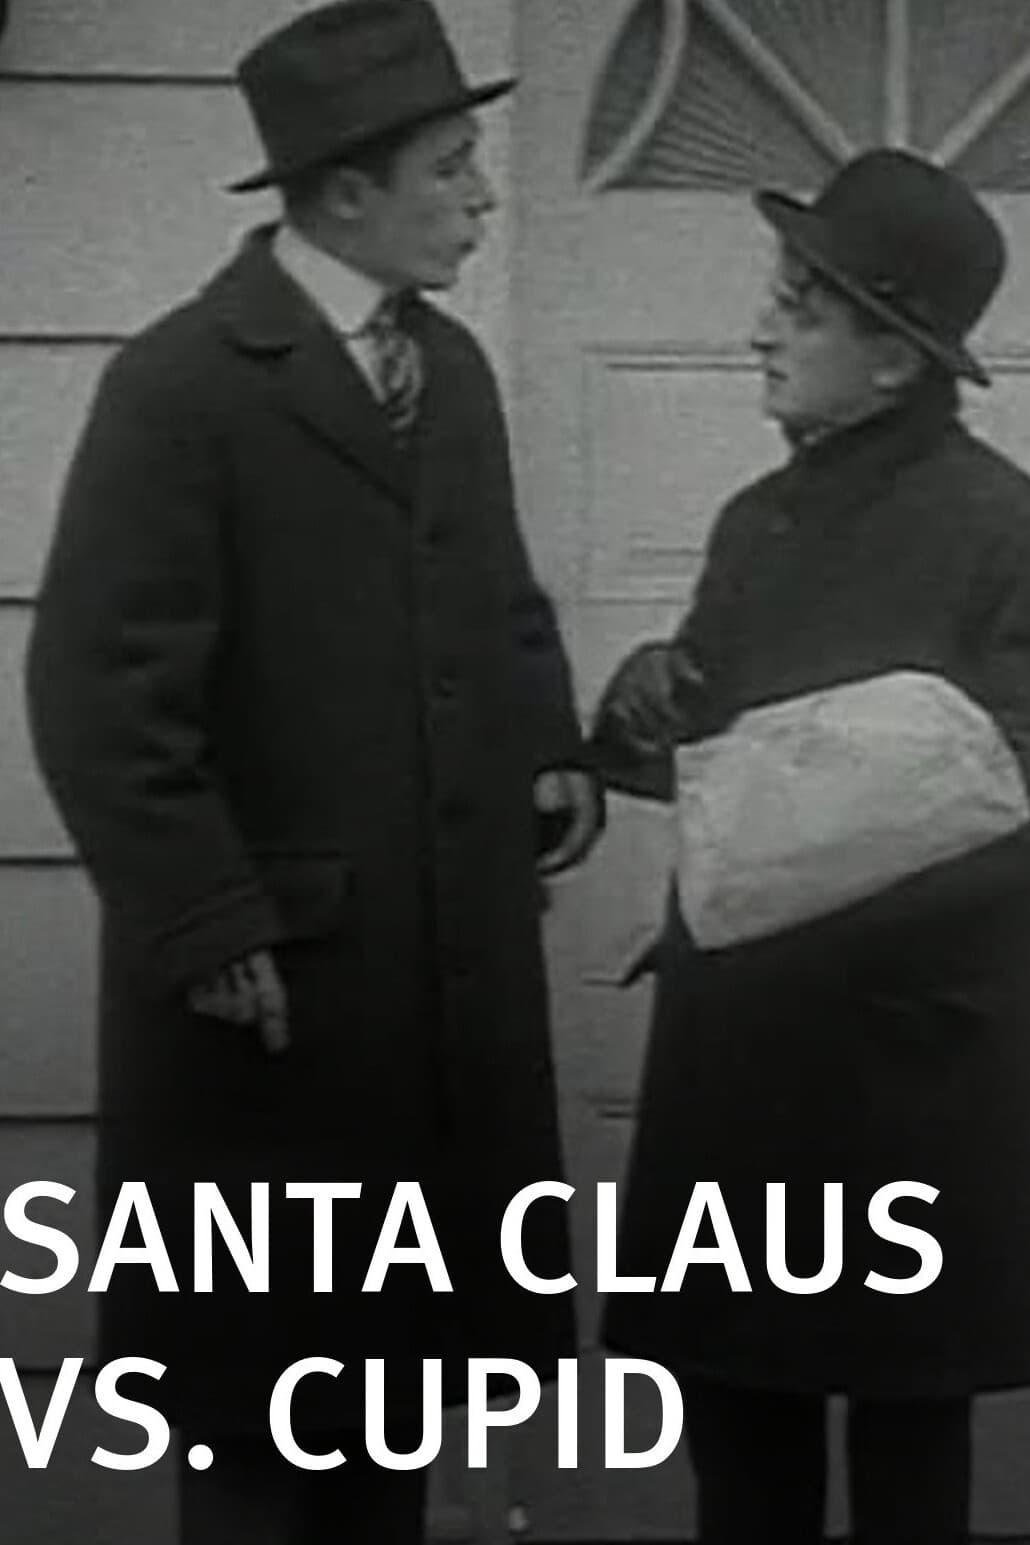 Santa Claus vs. Cupid